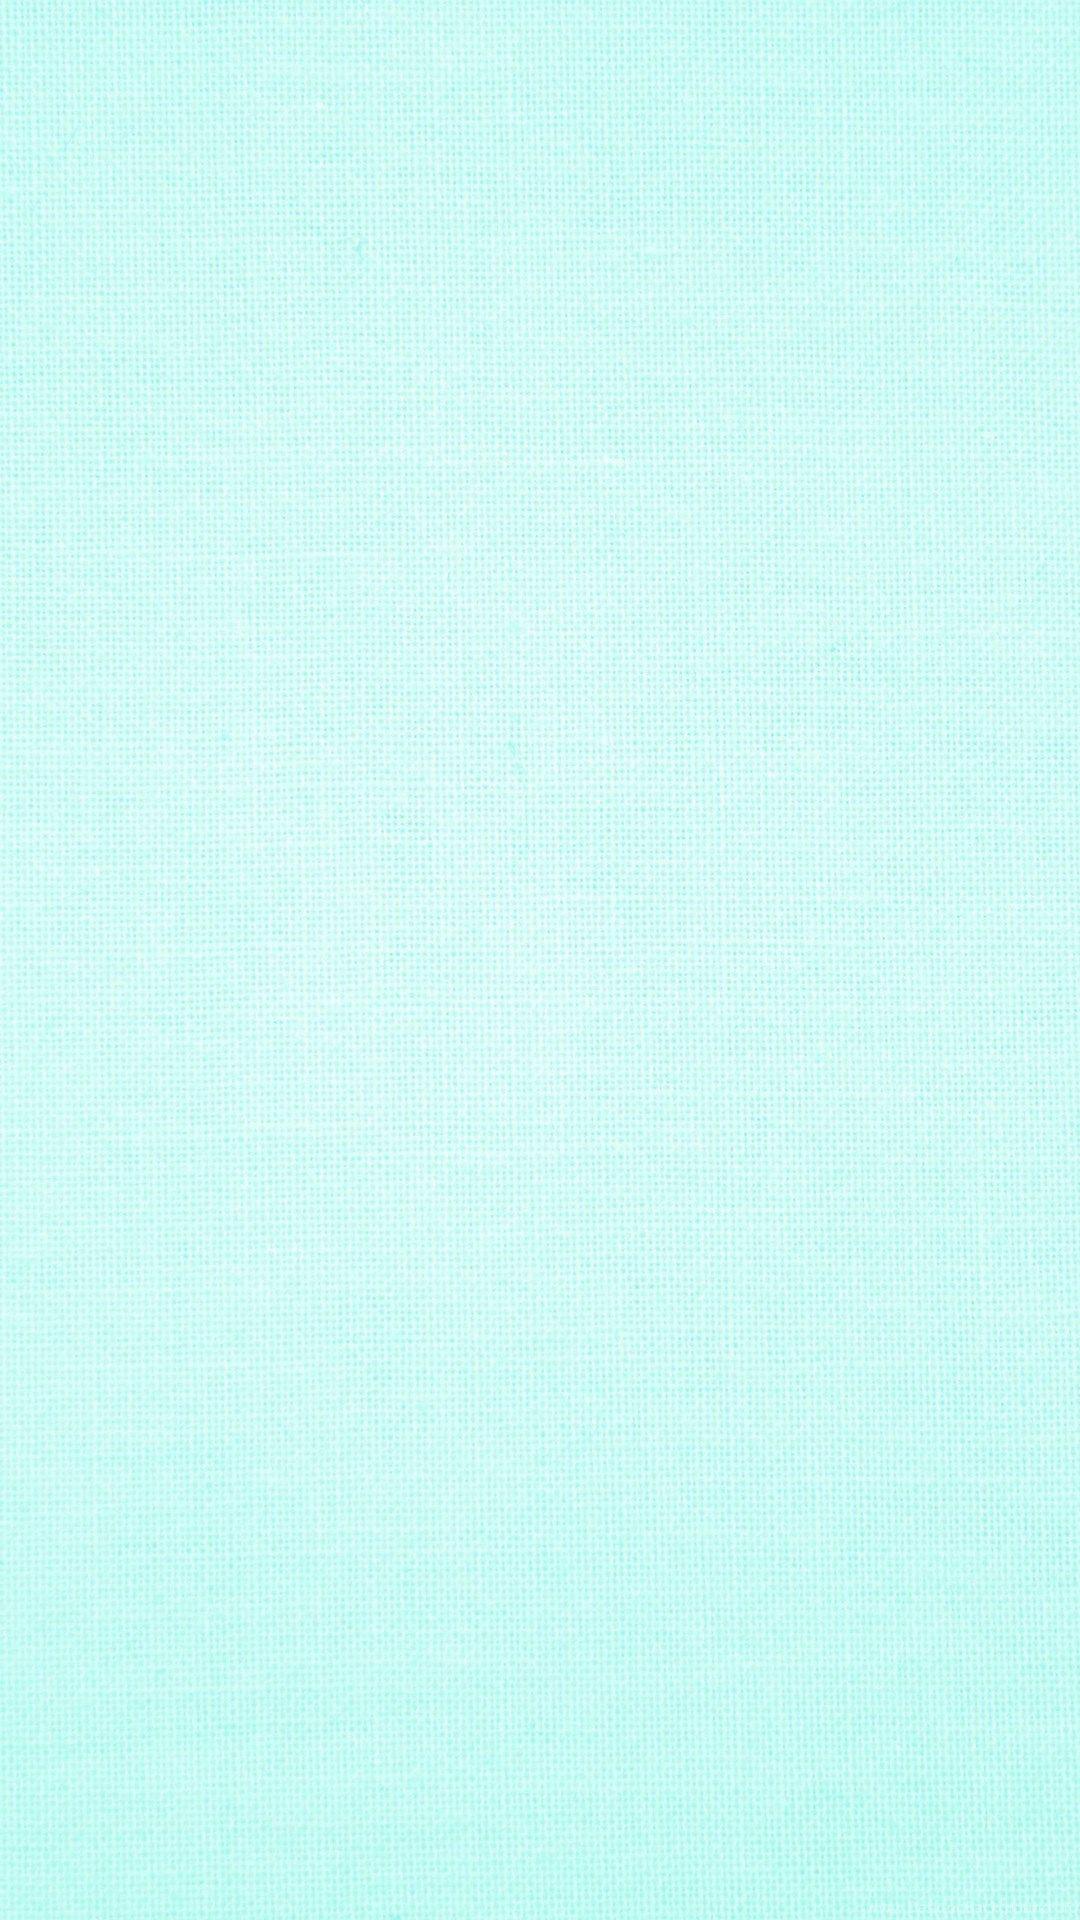 Plain Pastel Wallpapers - Wallpaper Cave